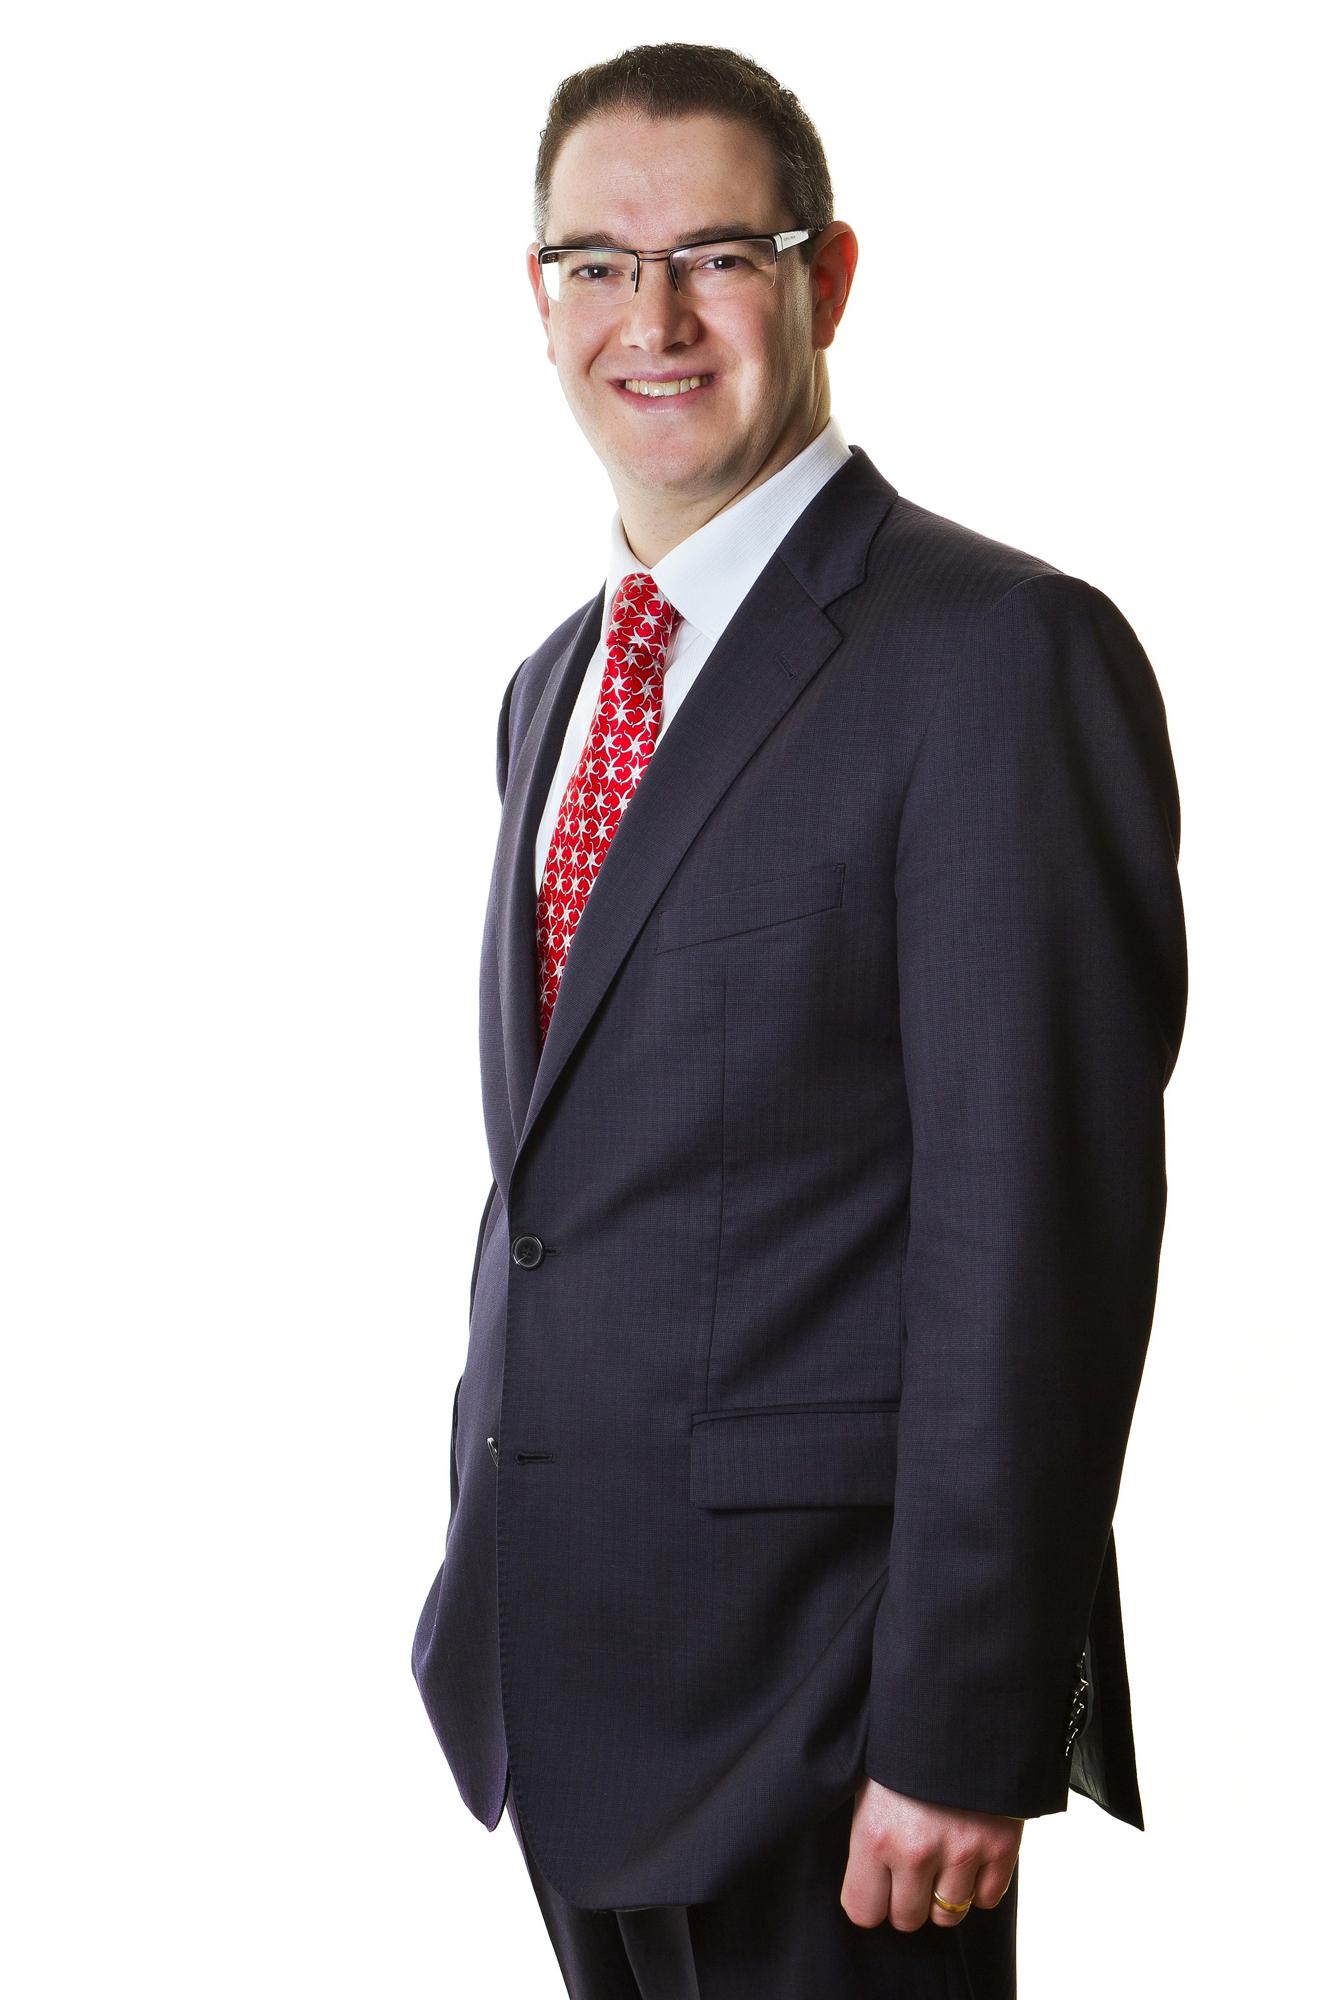 Michael Fitzsimons, trademark agent at TMR Fitzsimons